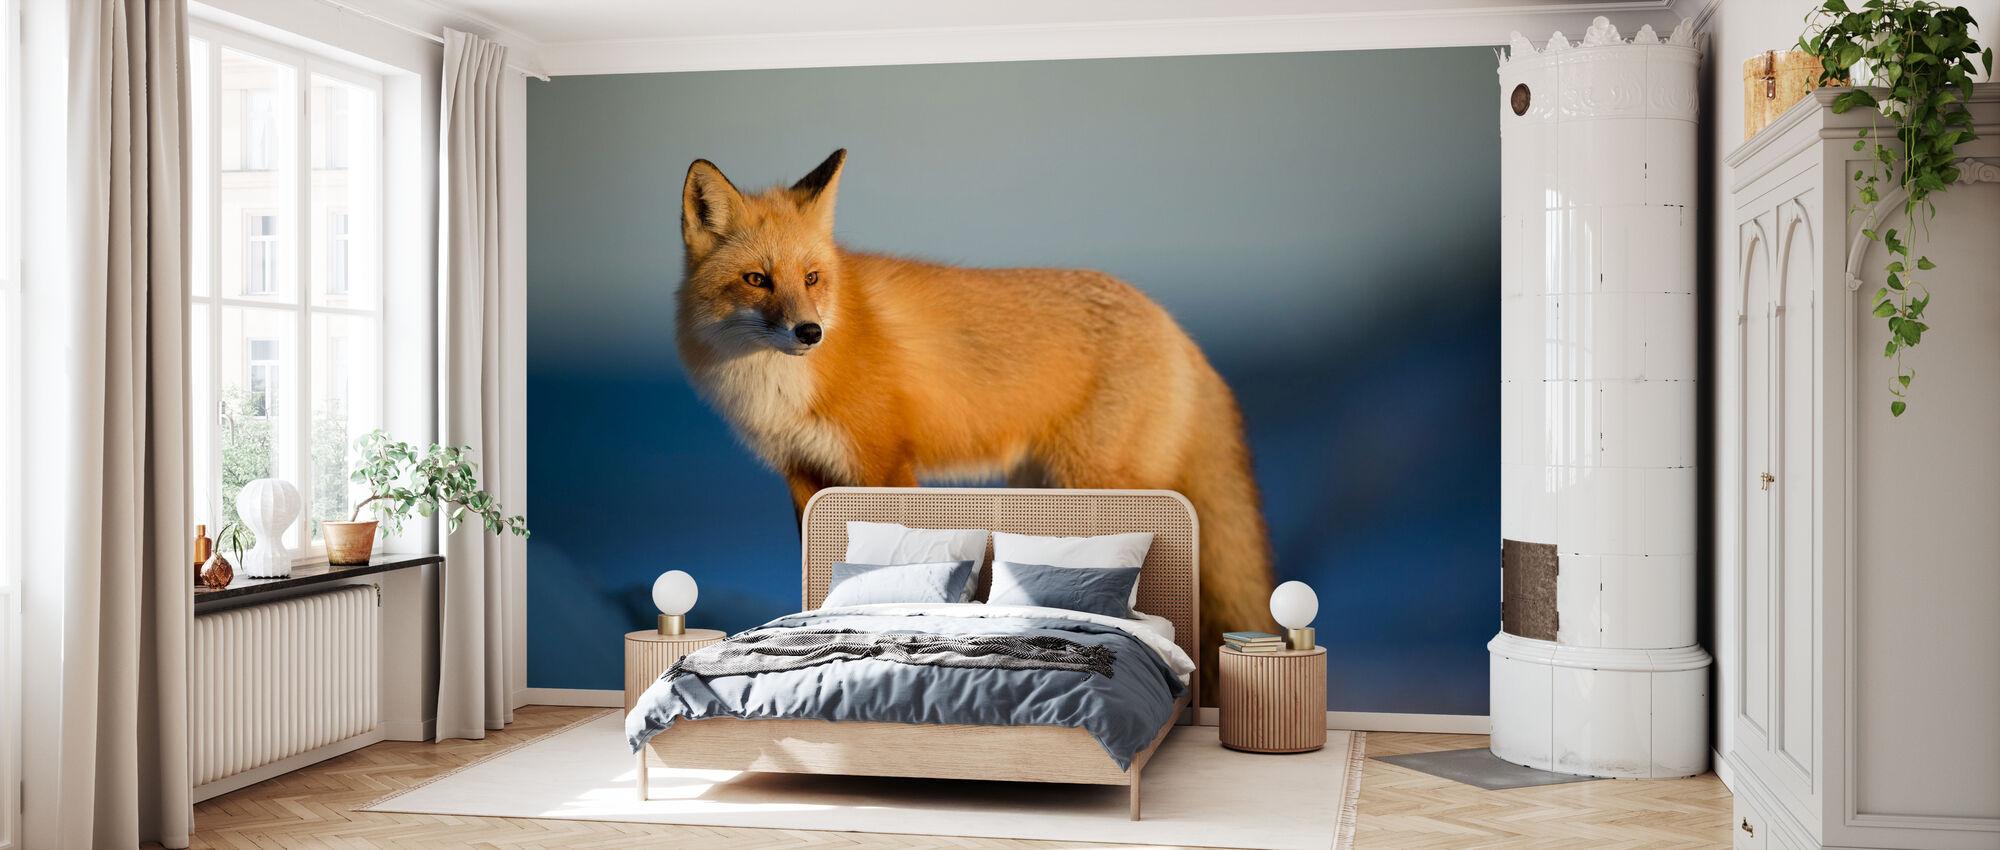 Stirring Fox - Tapet - Soverom